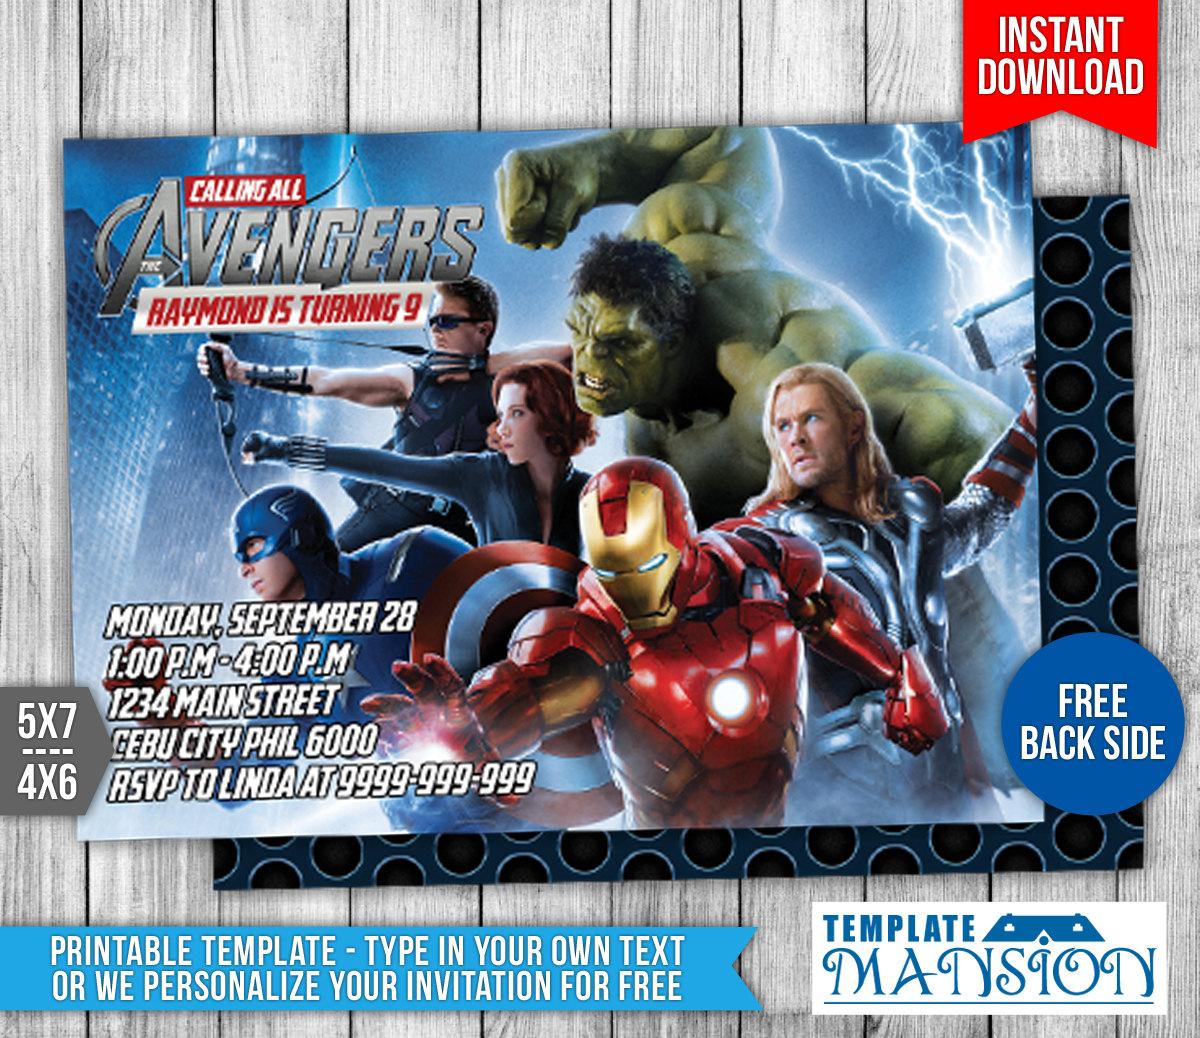 Avengers Birthday Invitation Templates Free Ukrandiffusion